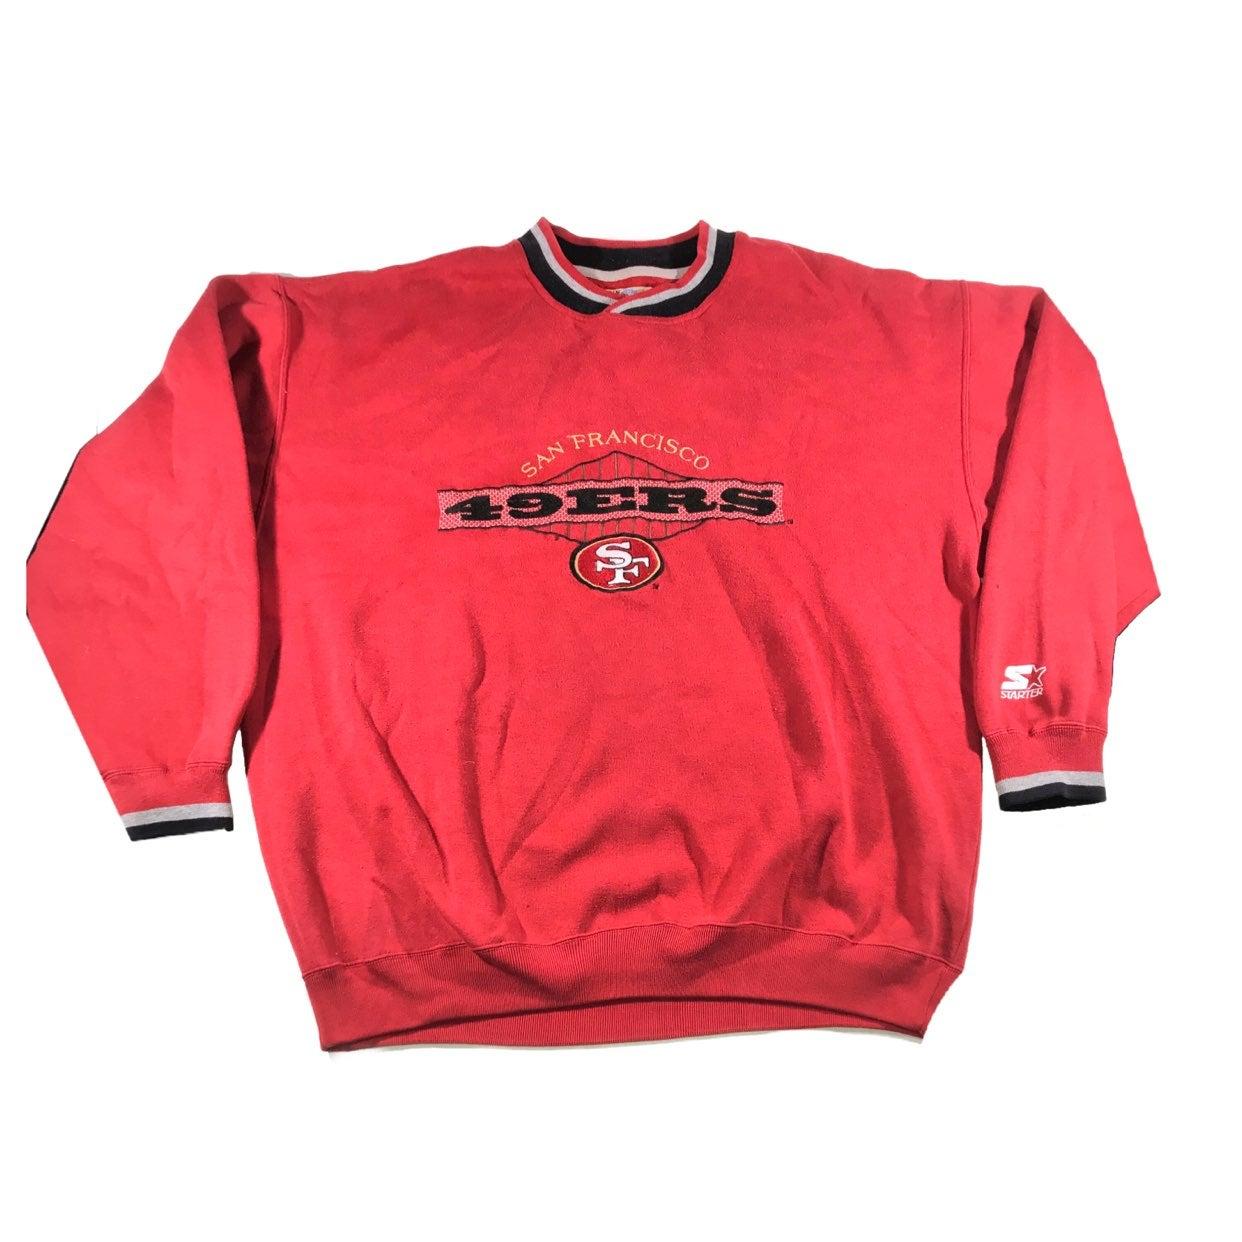 Vintage San Francisco 49ers sweater